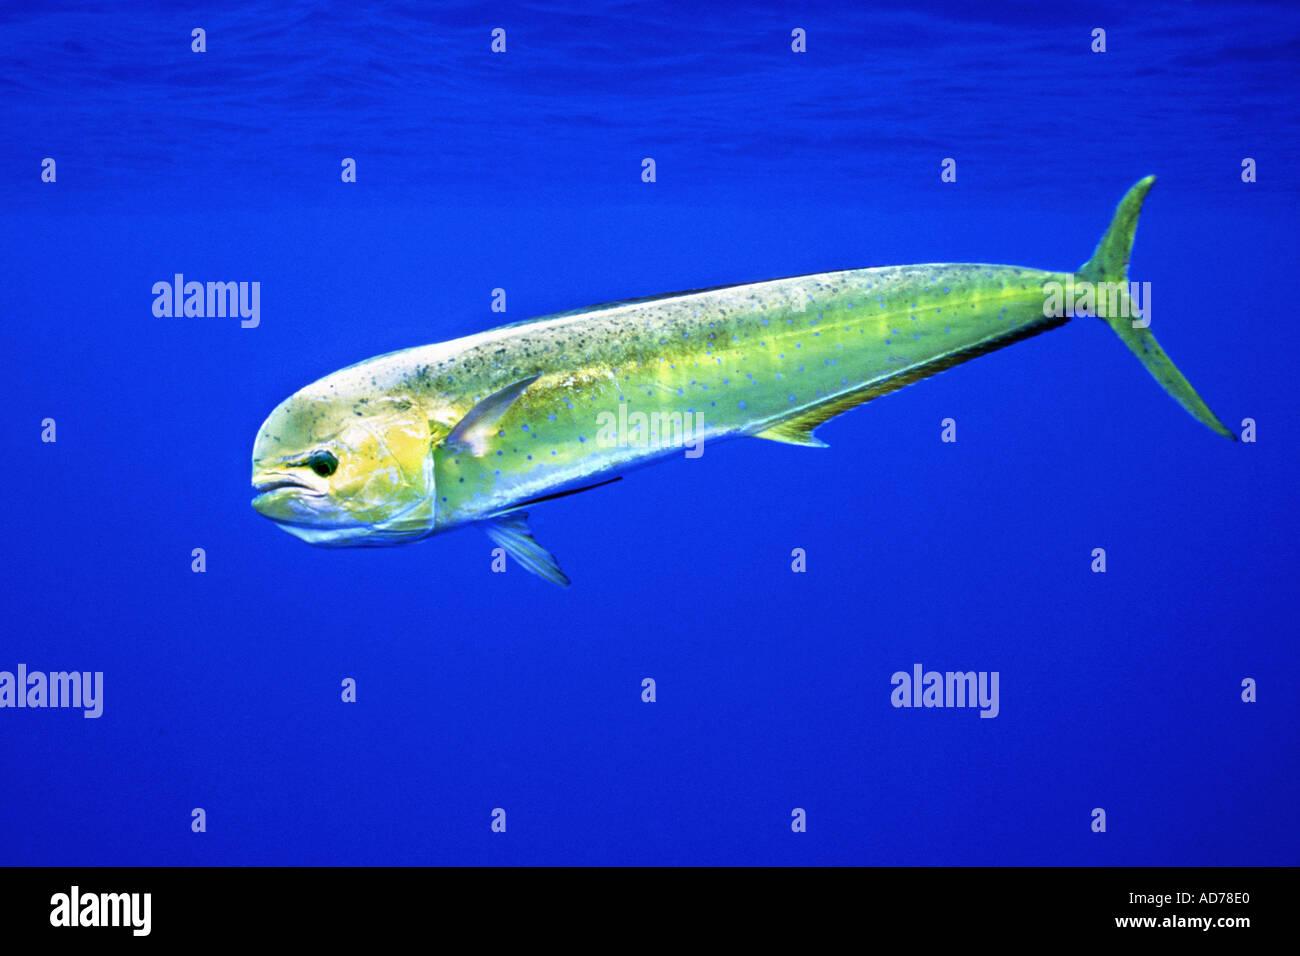 Mahi mahi dolphin fish or dorado coryphaena hippurus for Mahi mahi fish